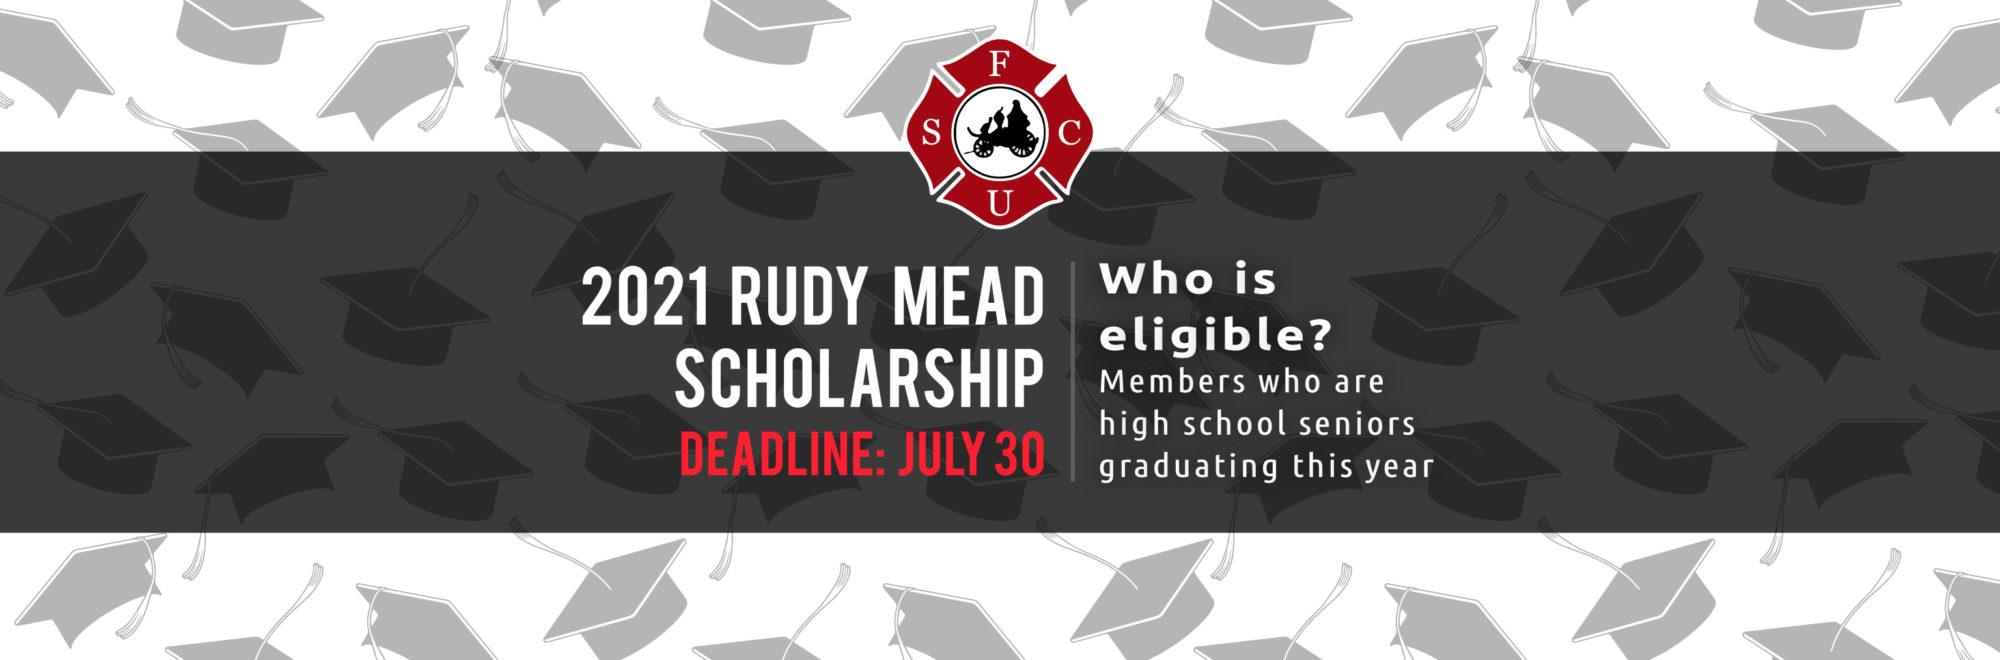 Rudy Mead Scholarship